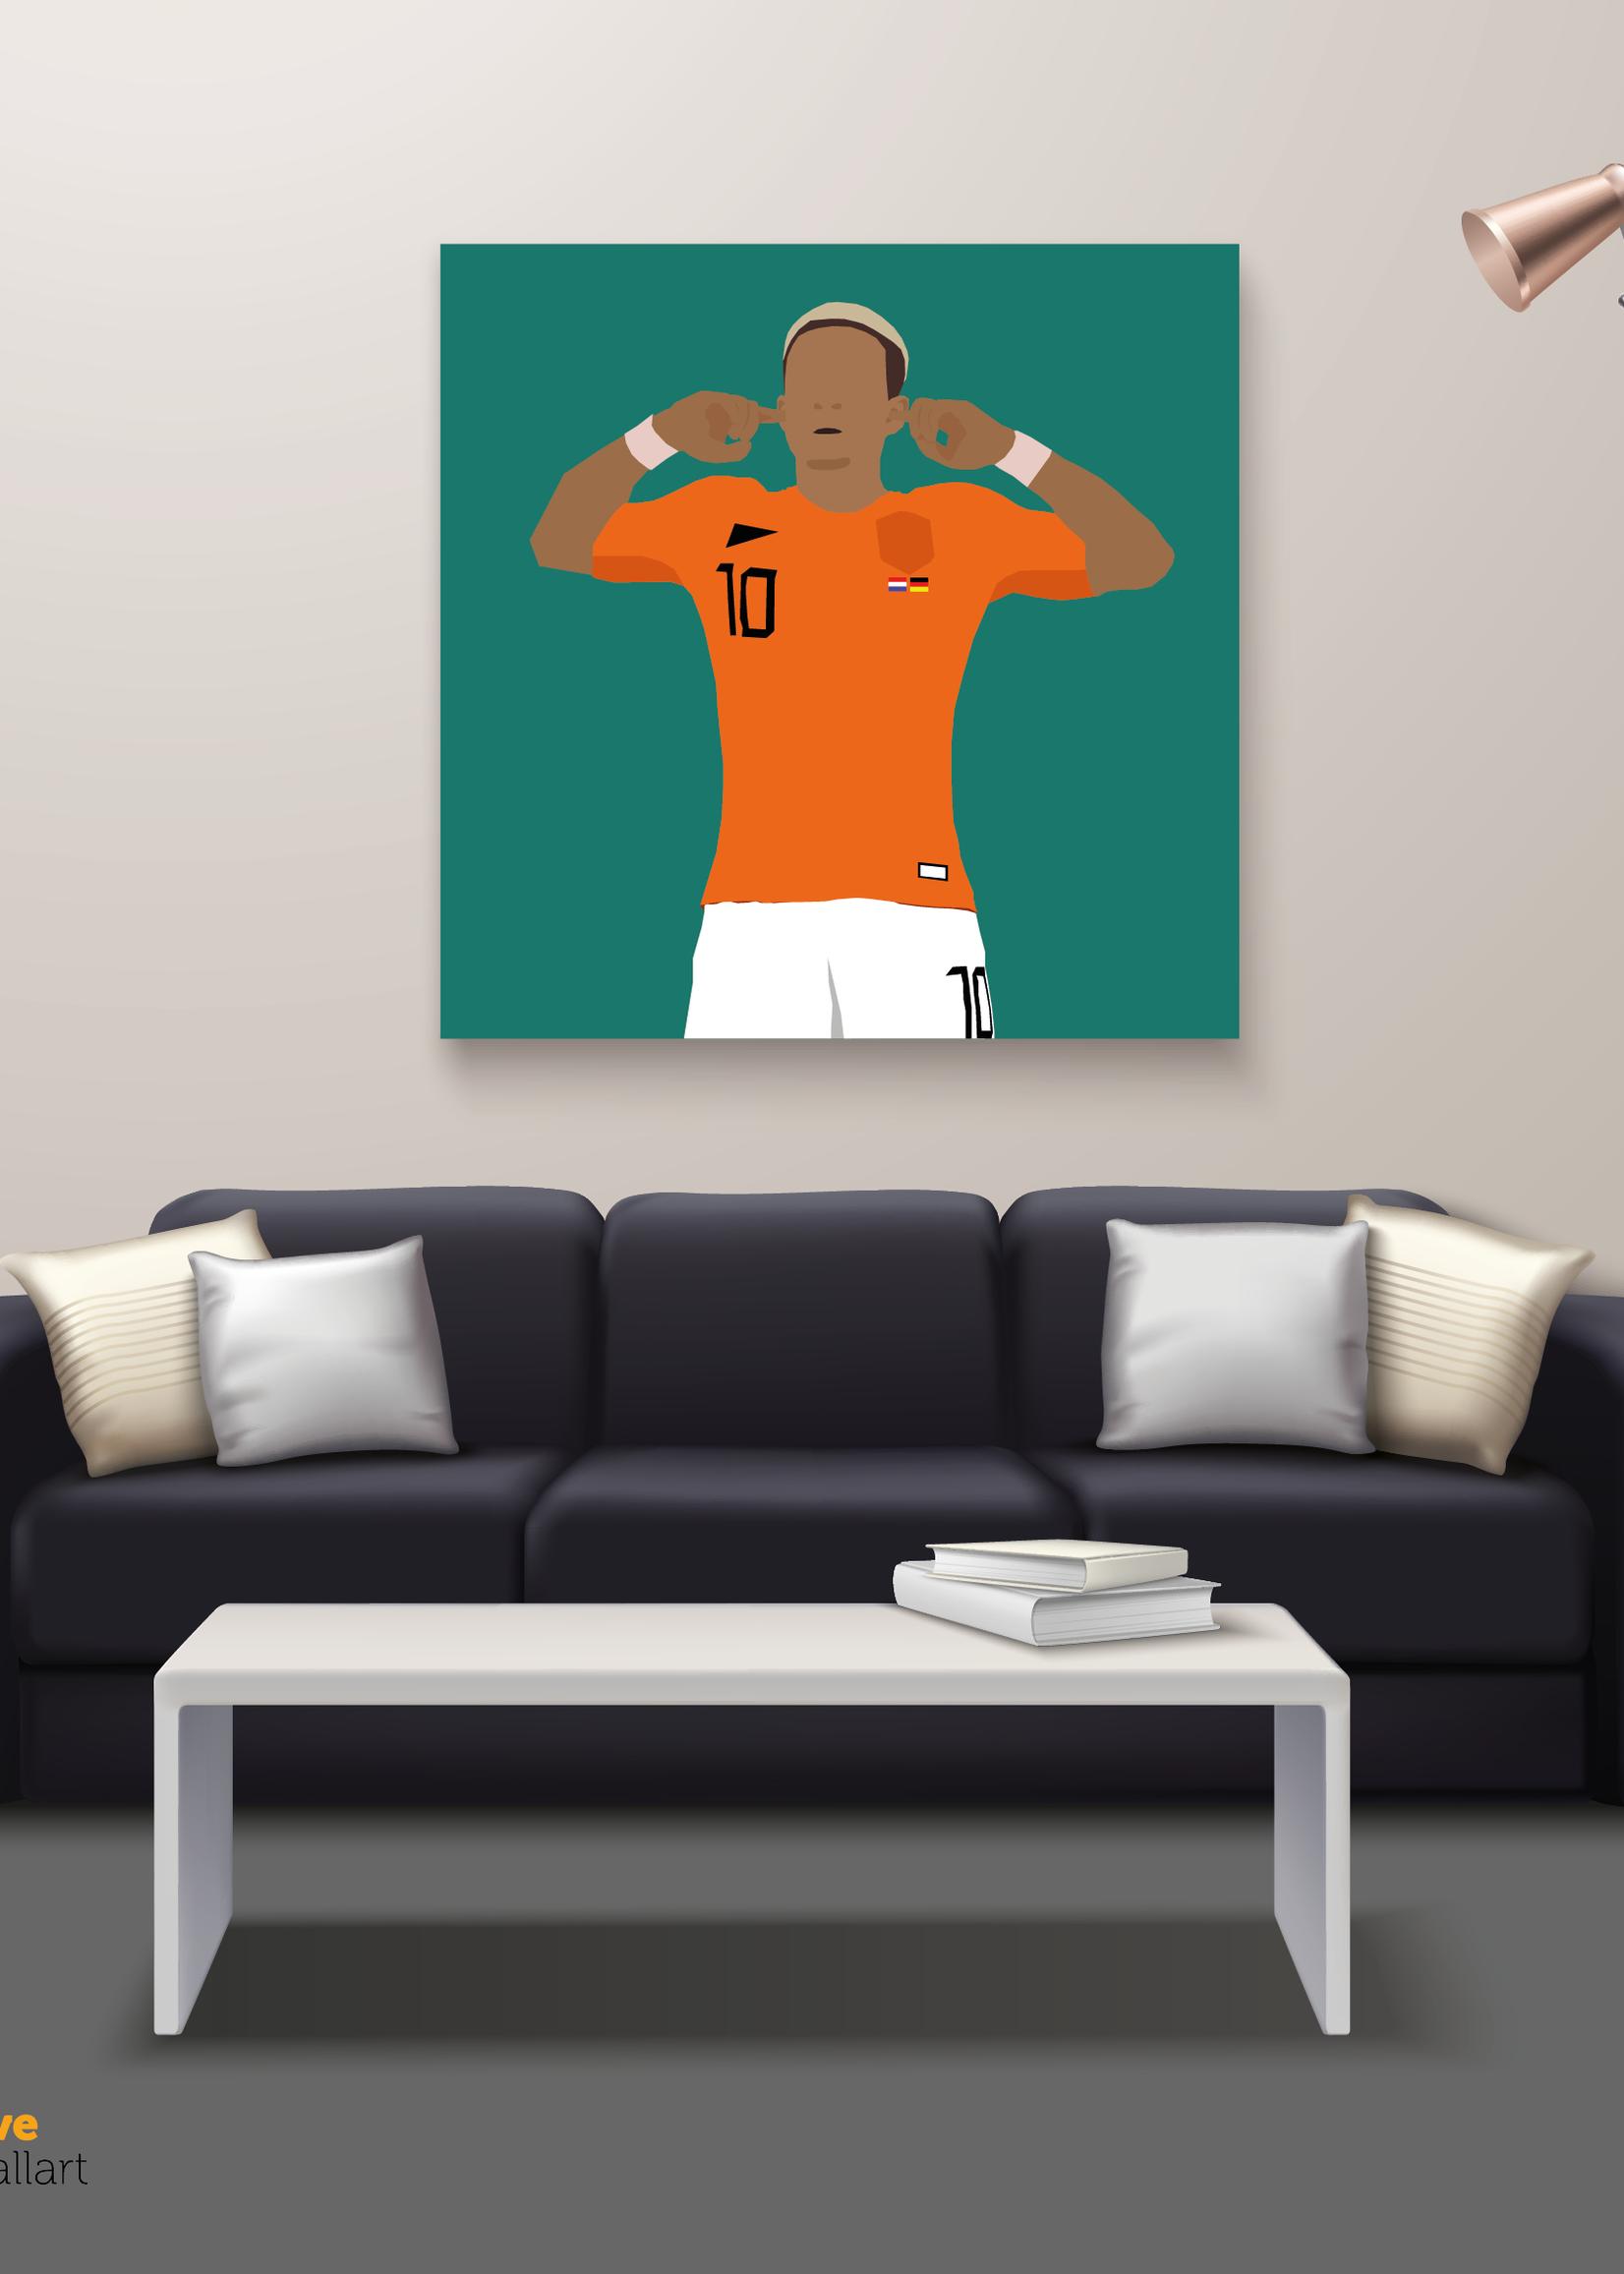 "We Love Football Art ""Dream, believe, archieve"" We Love Football Art"